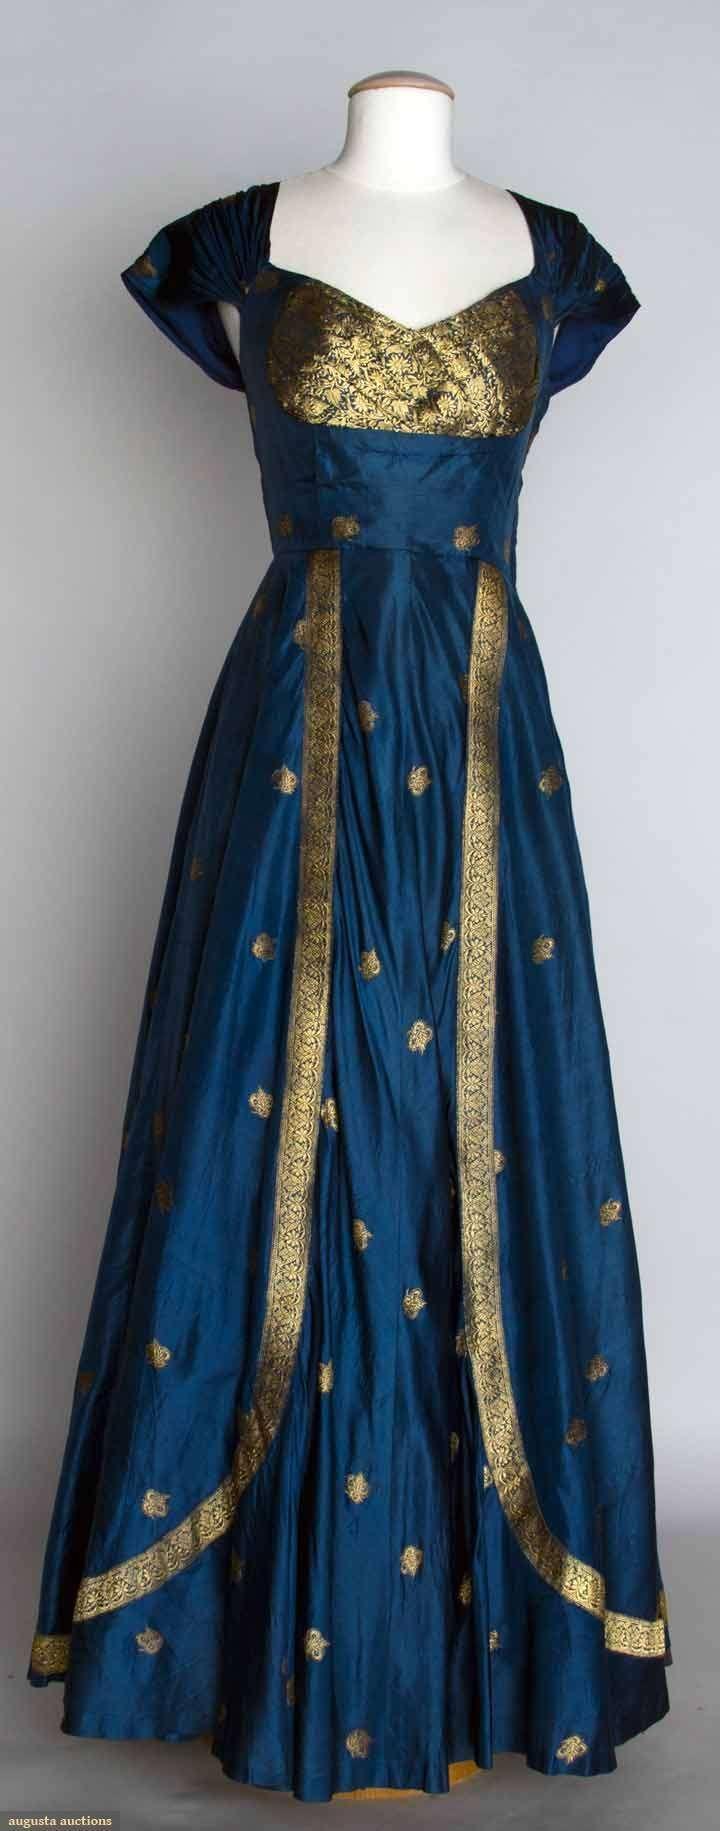 blue fantasy dress - Google Search